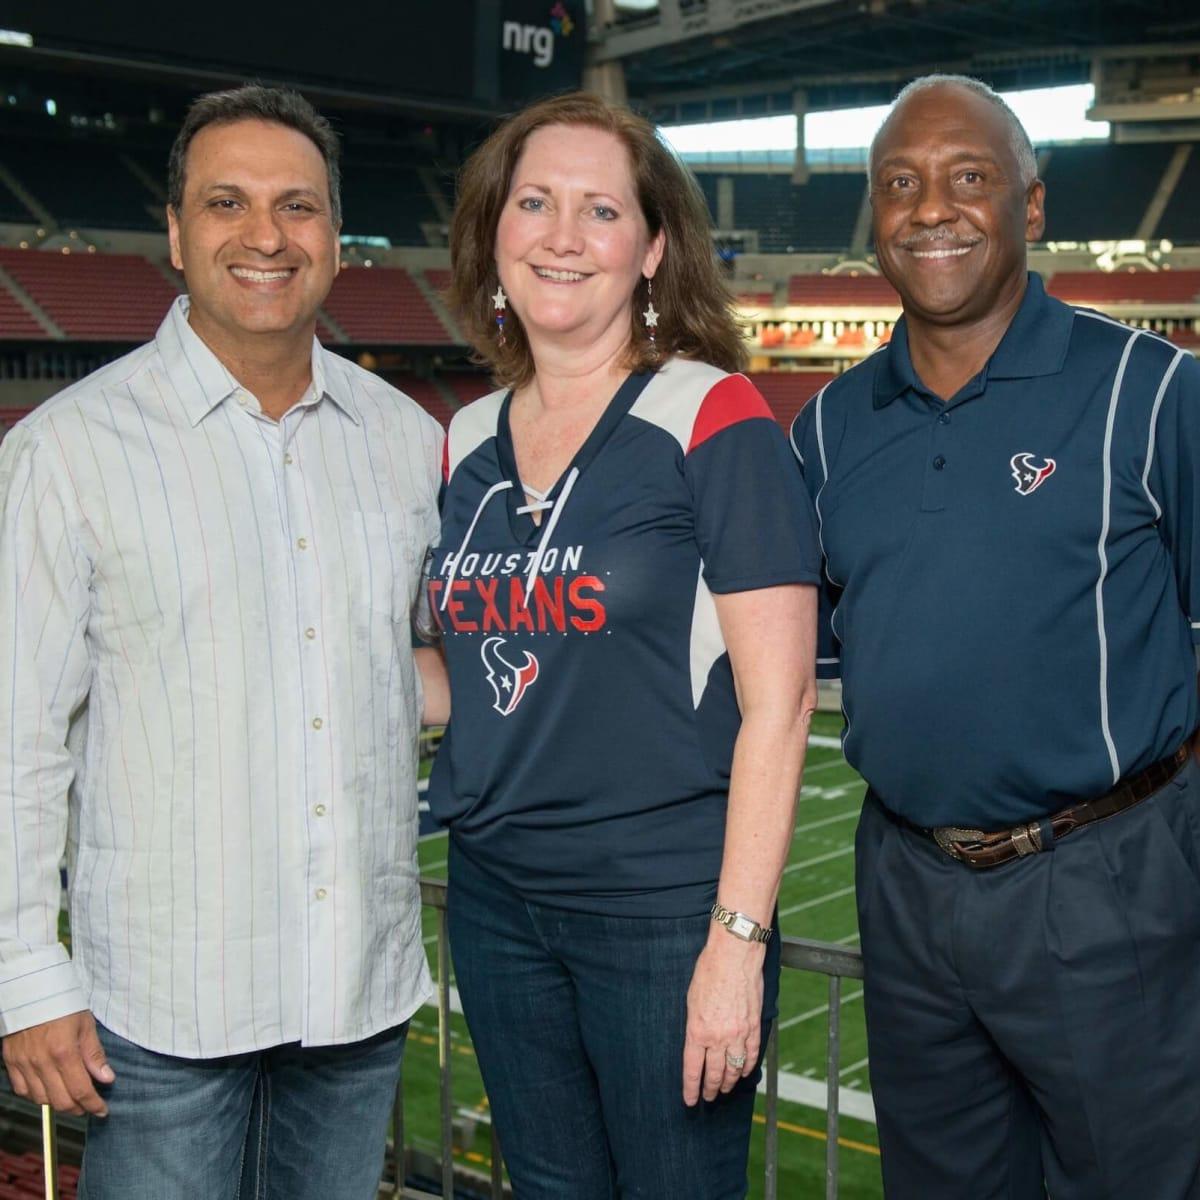 Fantasy Football, 9/16, Darayus Paradivala, Diane Englet, Fred Newhouse